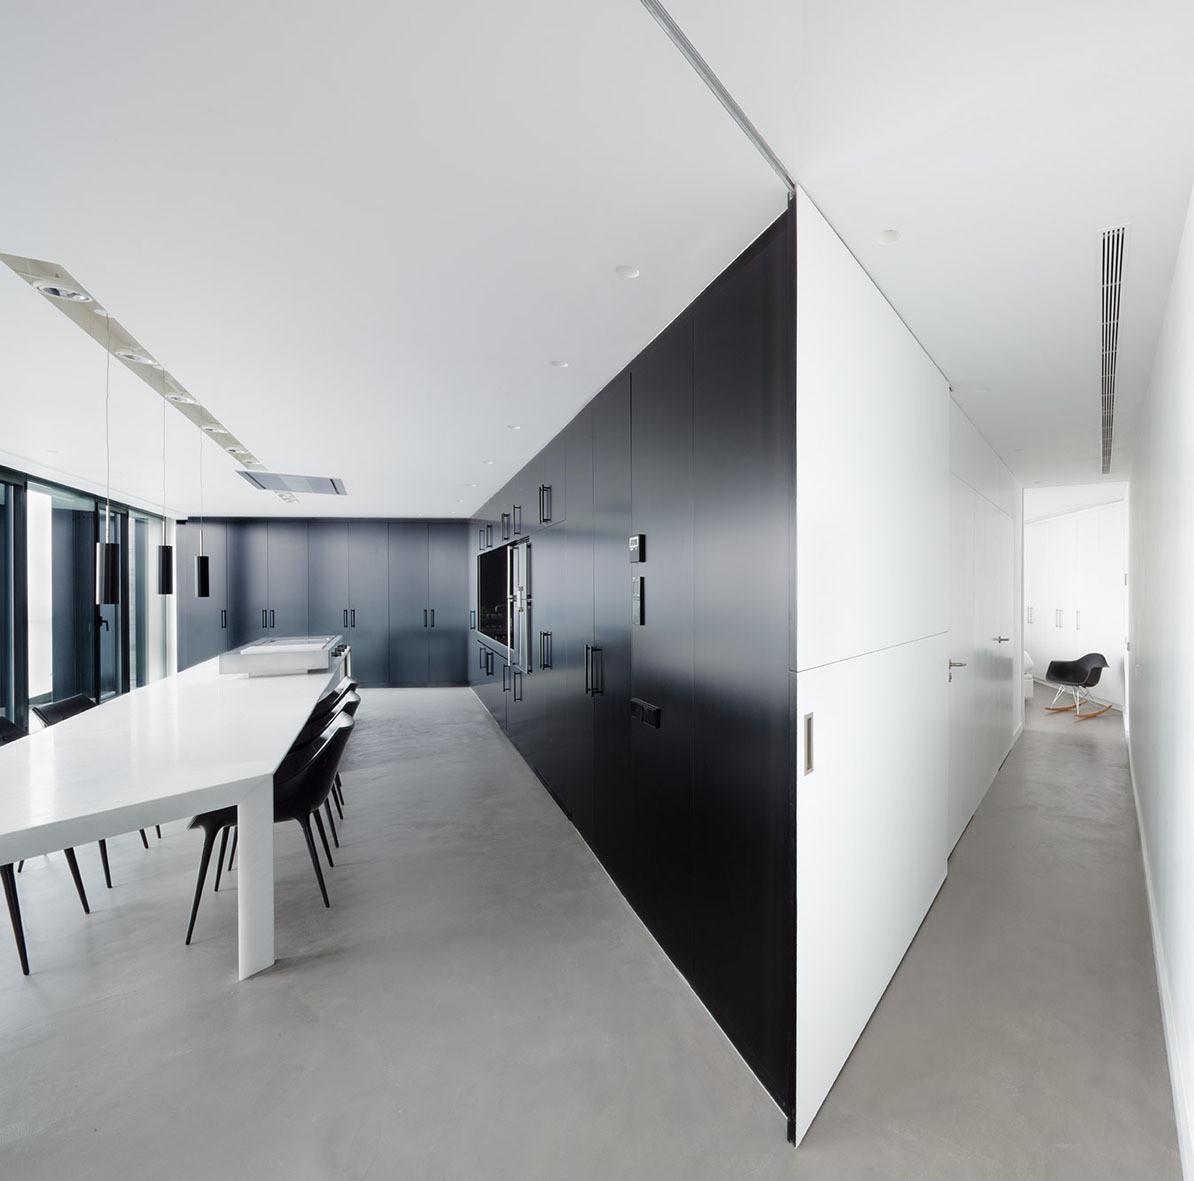 Casa X / Cadaval & Solà-Morales . Image © Sandra Pereznieto